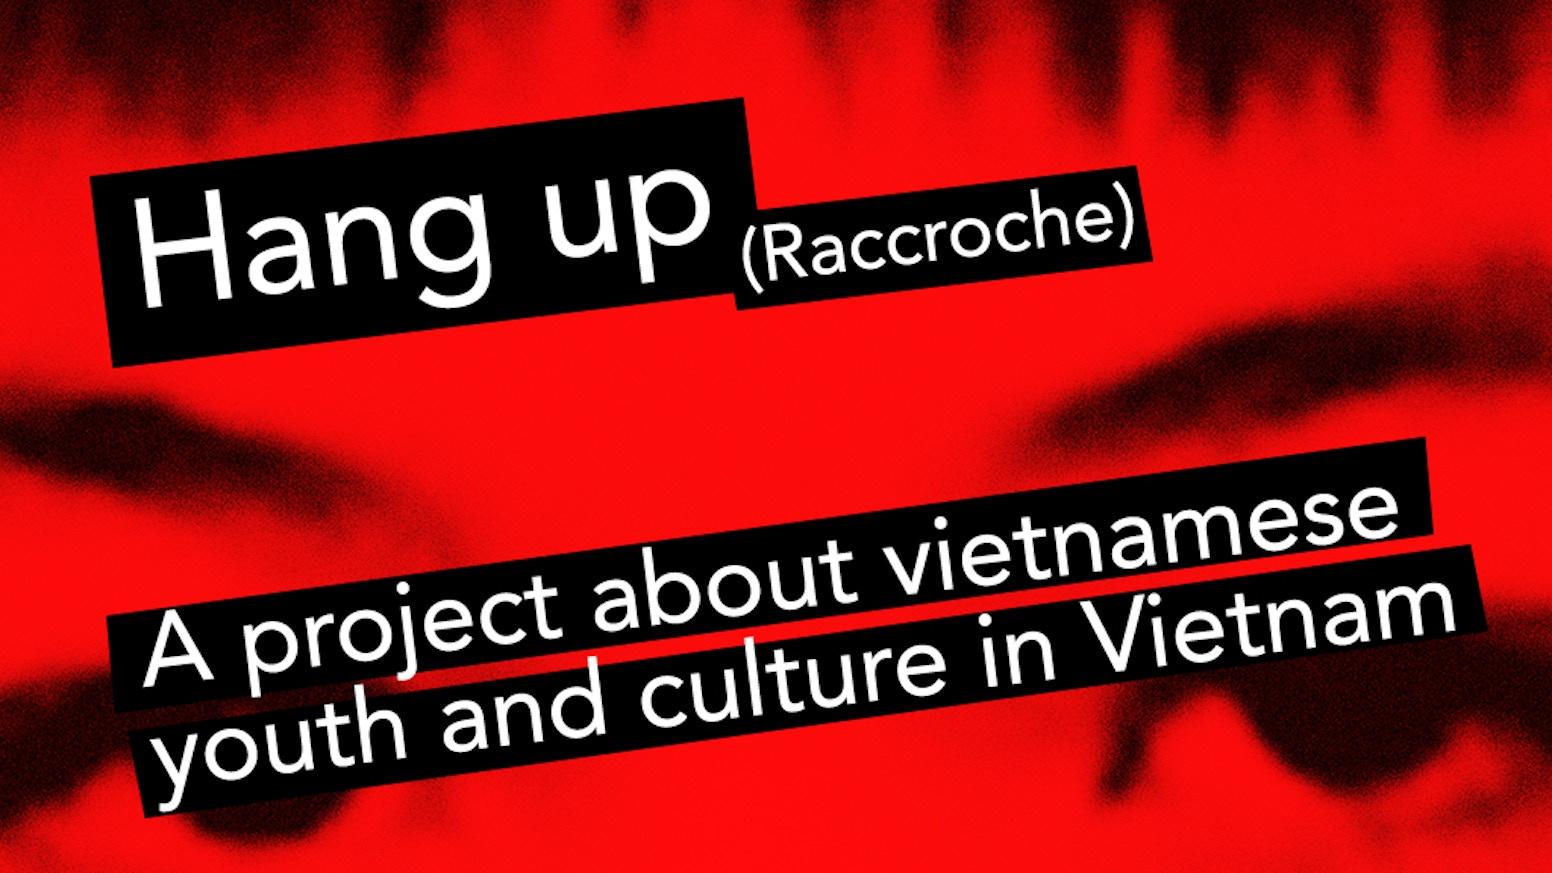 Hang up (Raccroche) by Prune Phi — Kickstarter